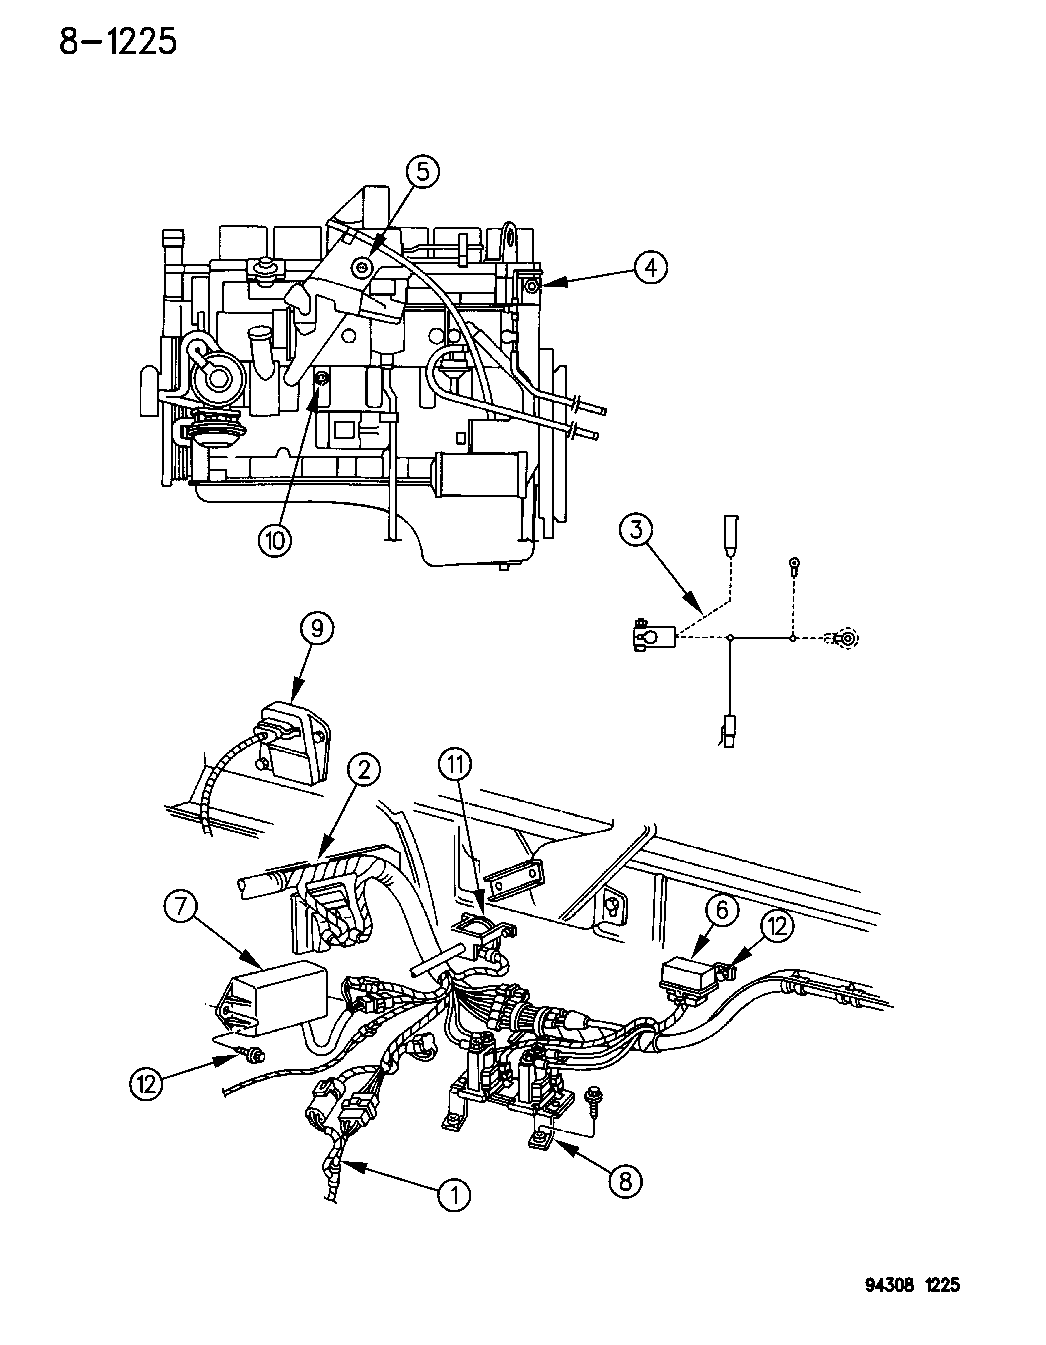 Dodge Ram 1500 Suspension Diagram Auto Parts Diagrams